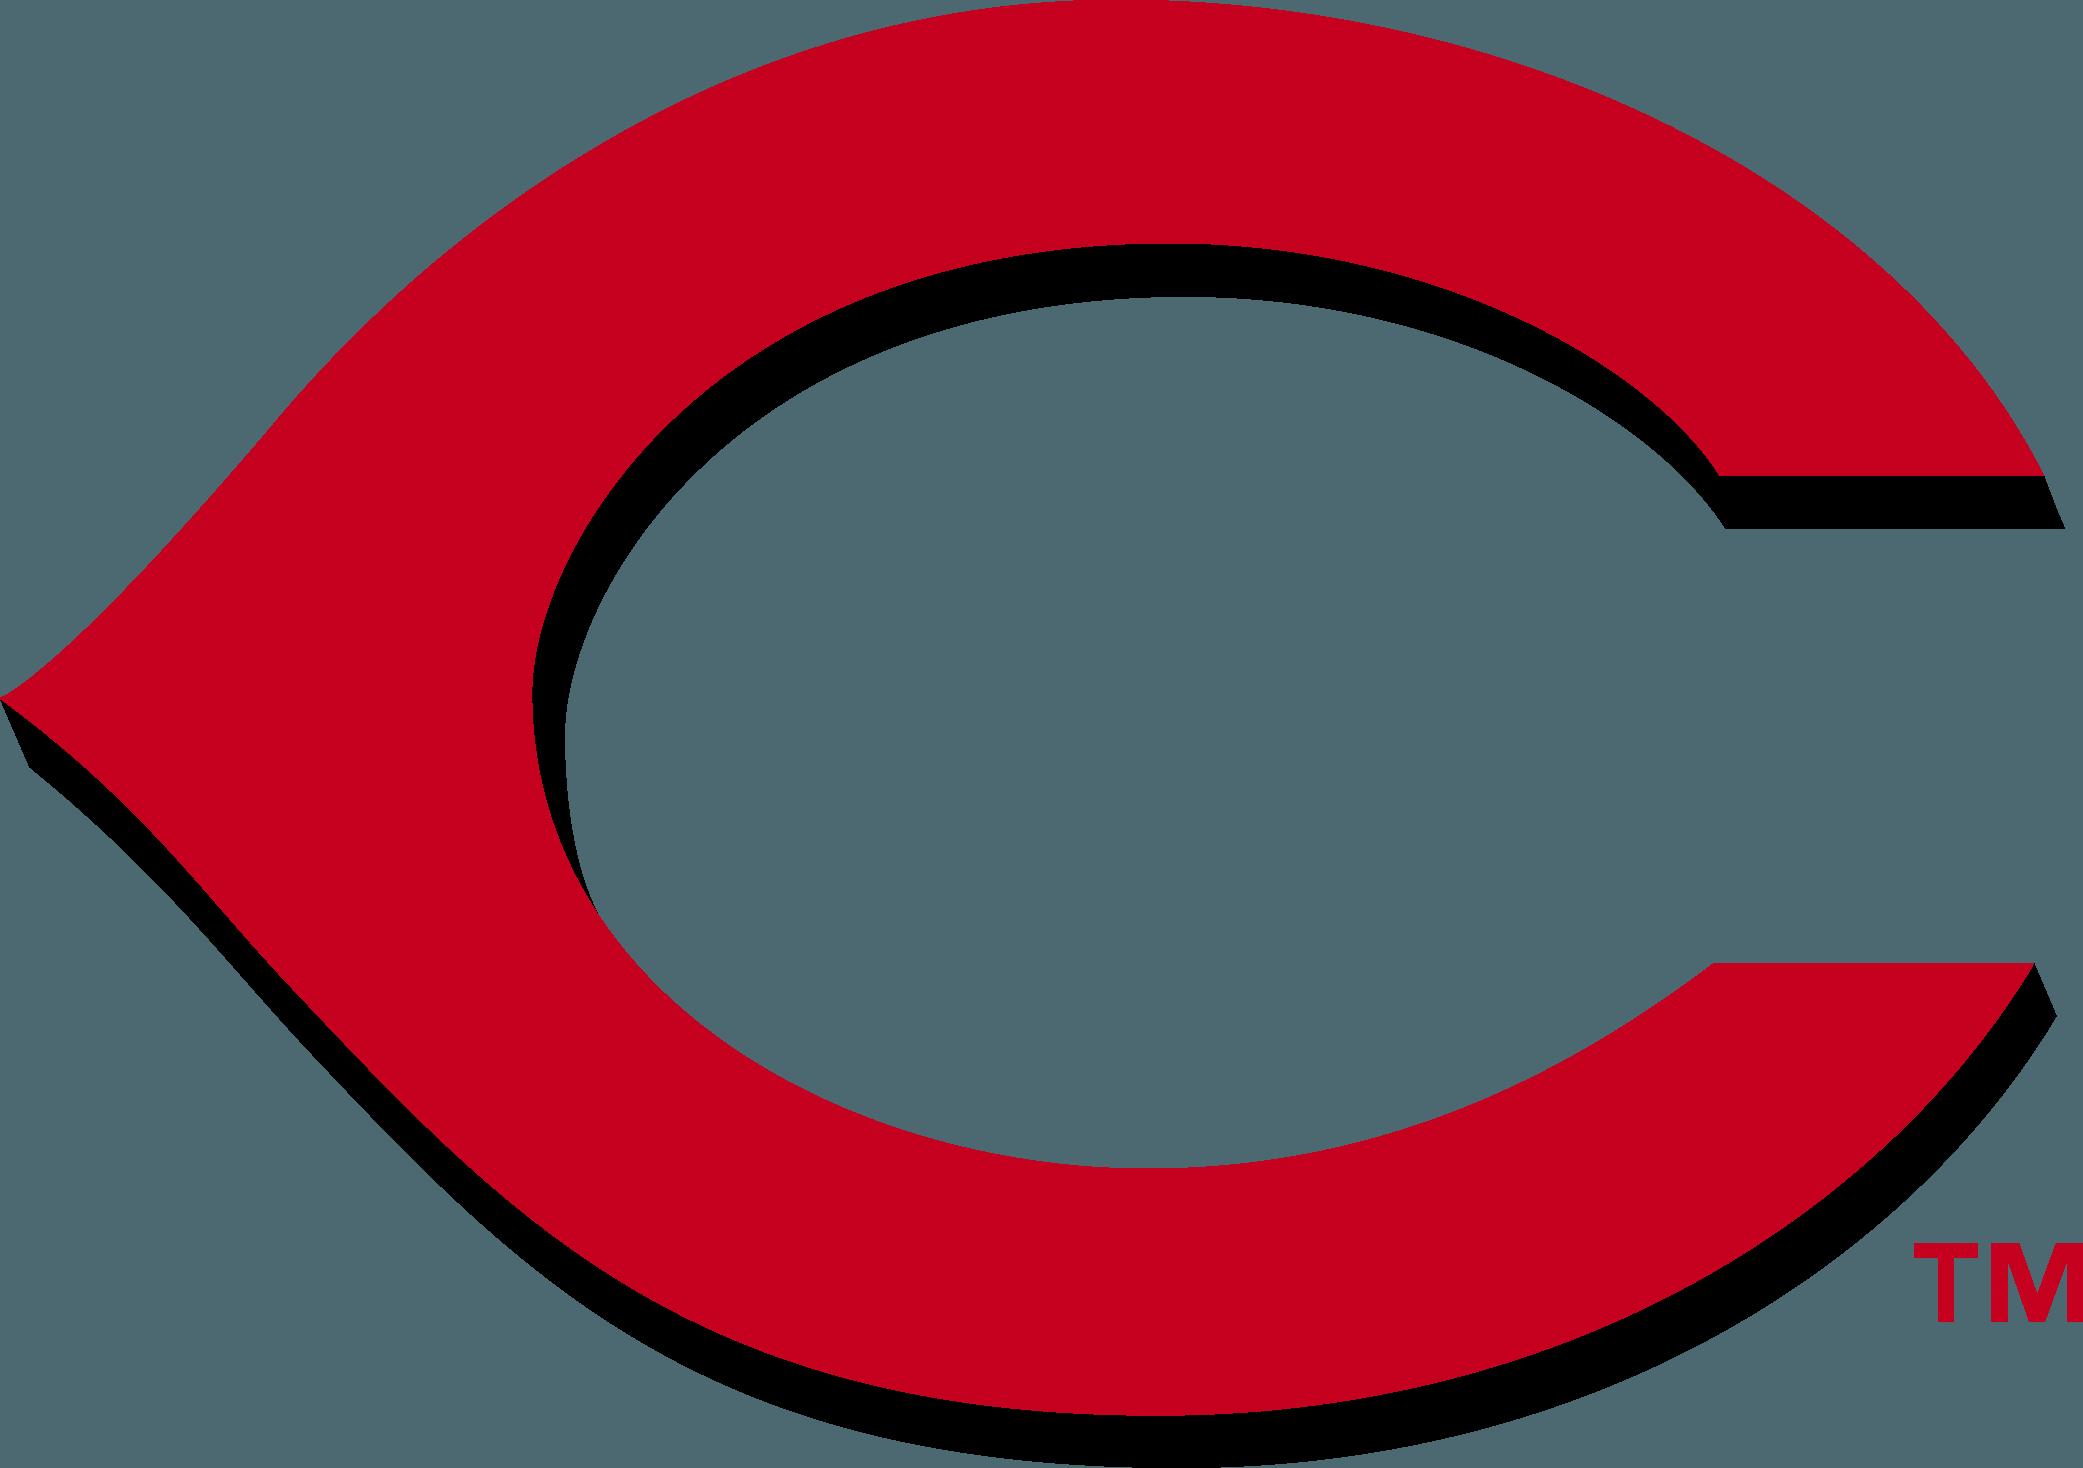 Cincinnati Reds Logo Png Image Cincinnati Reds Red Logo Cincinnati